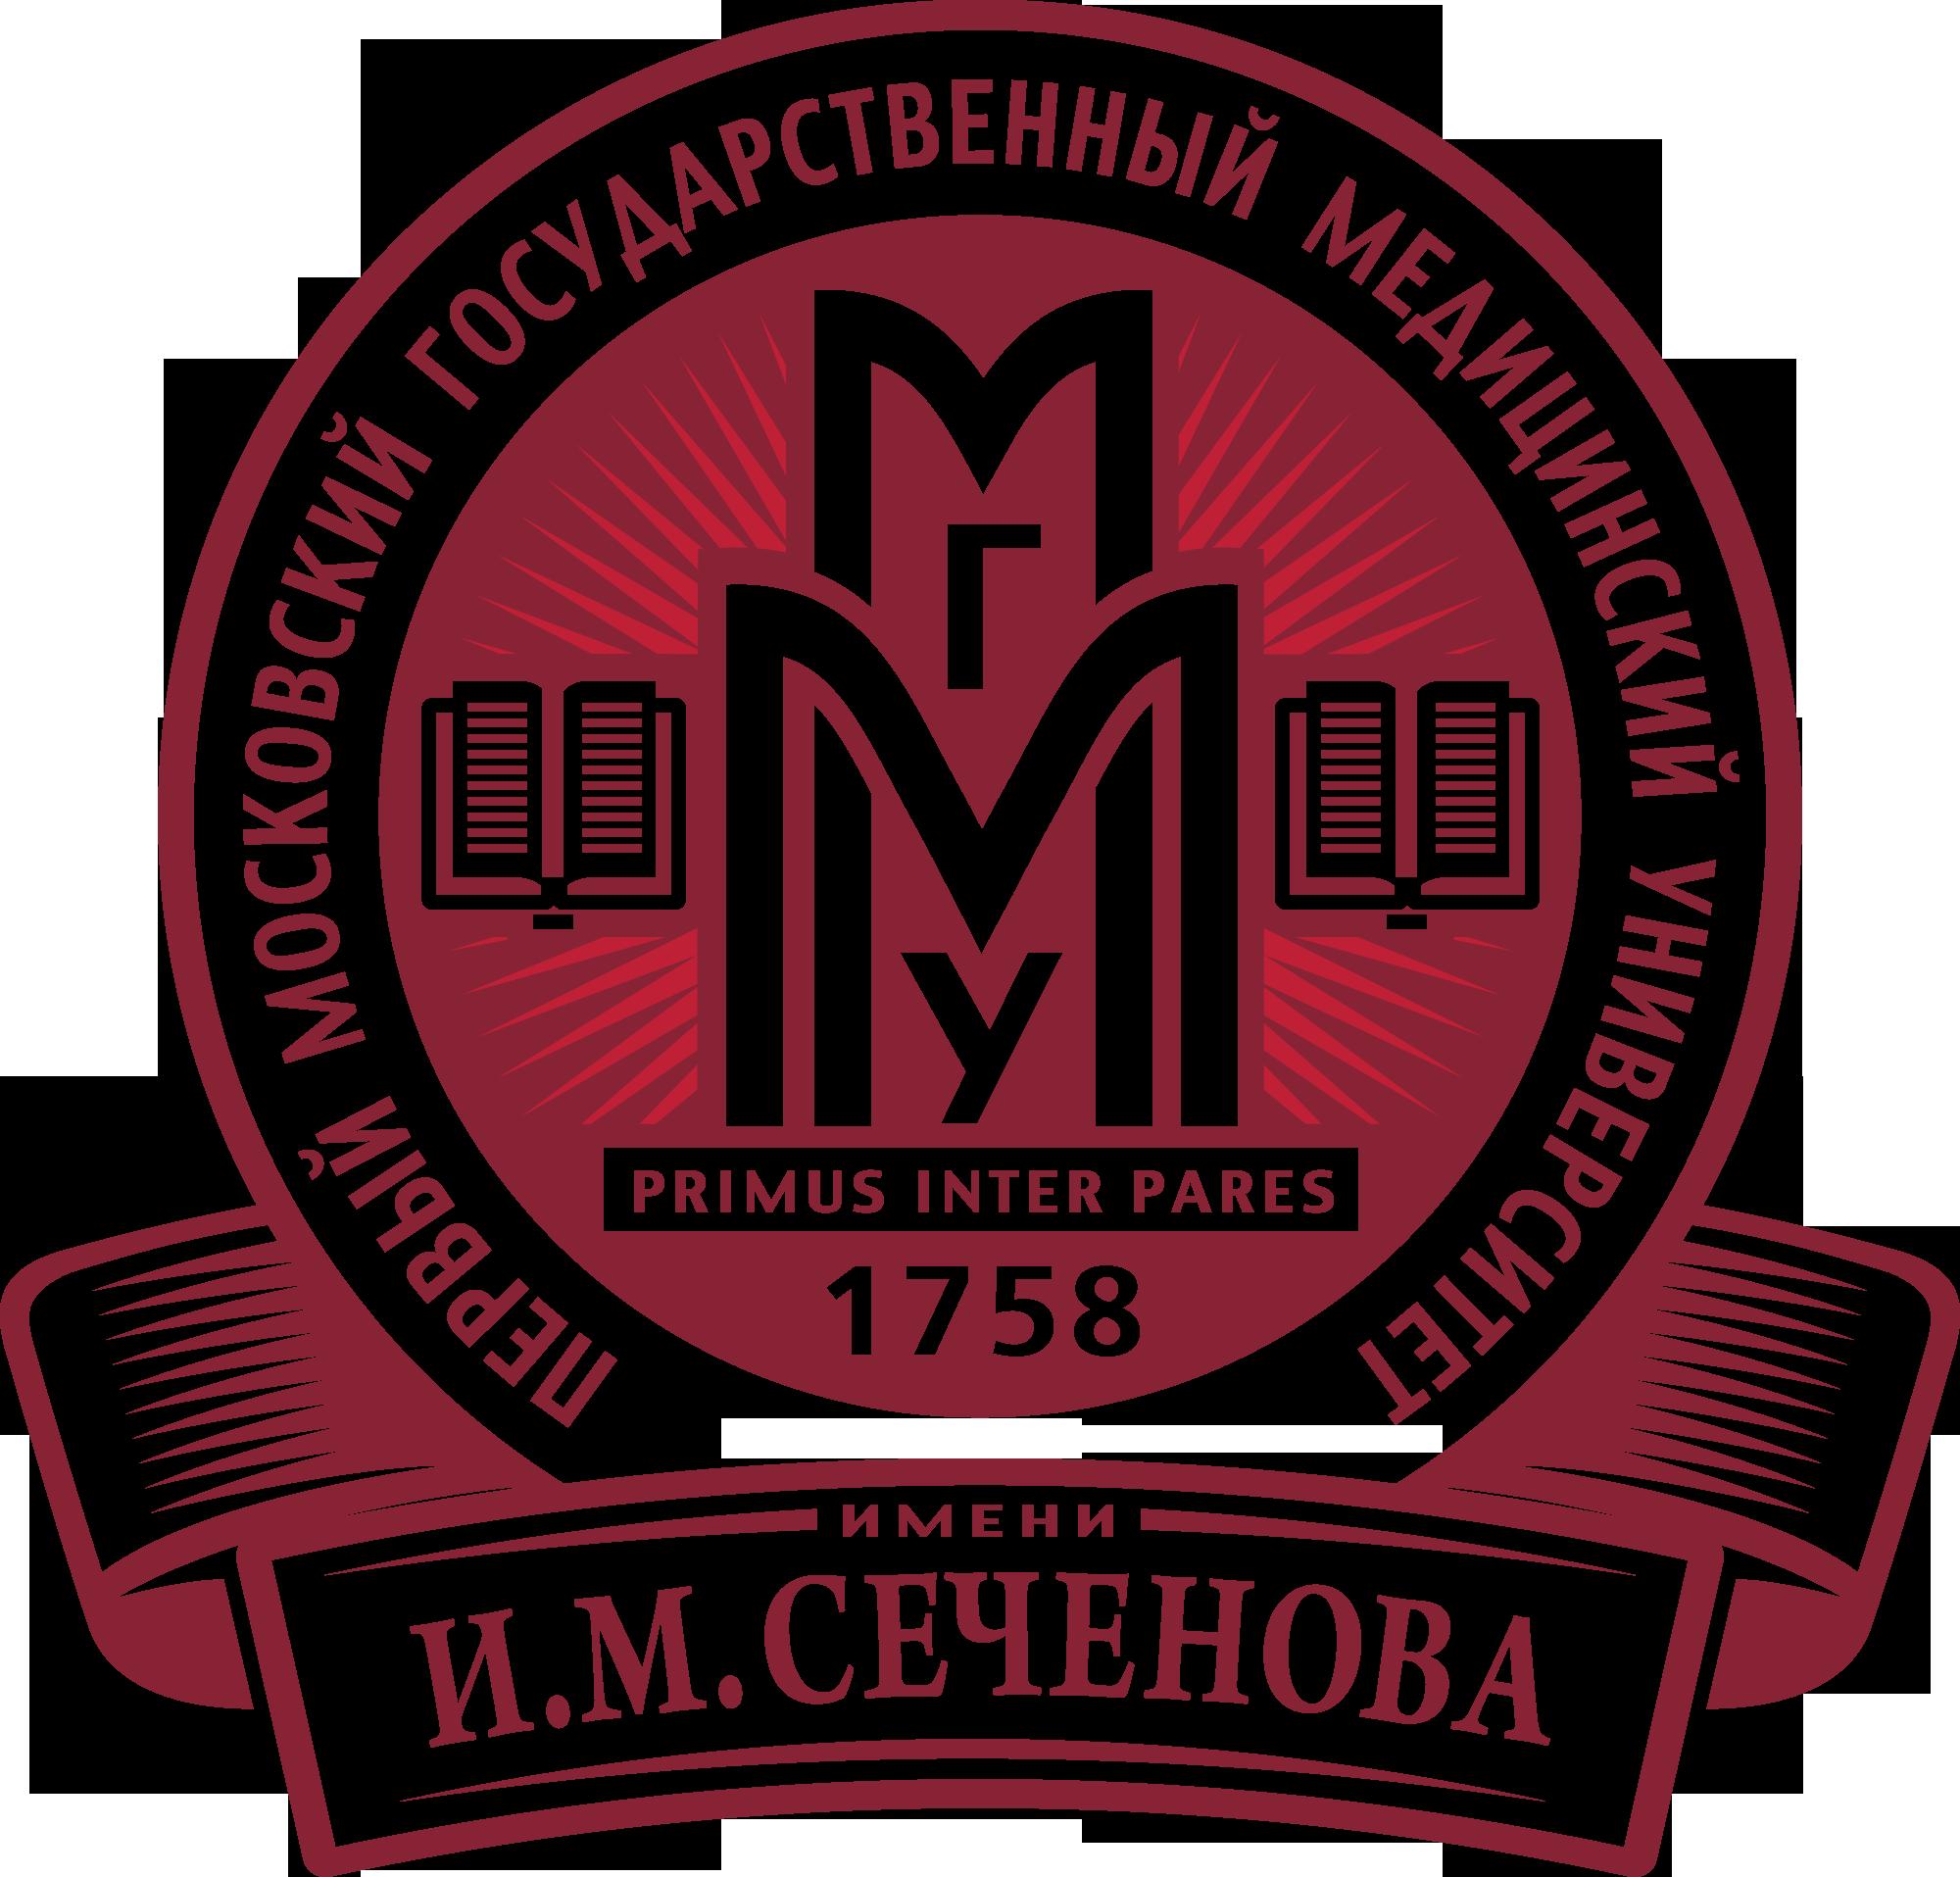 Эмблема мед университета Сеченова